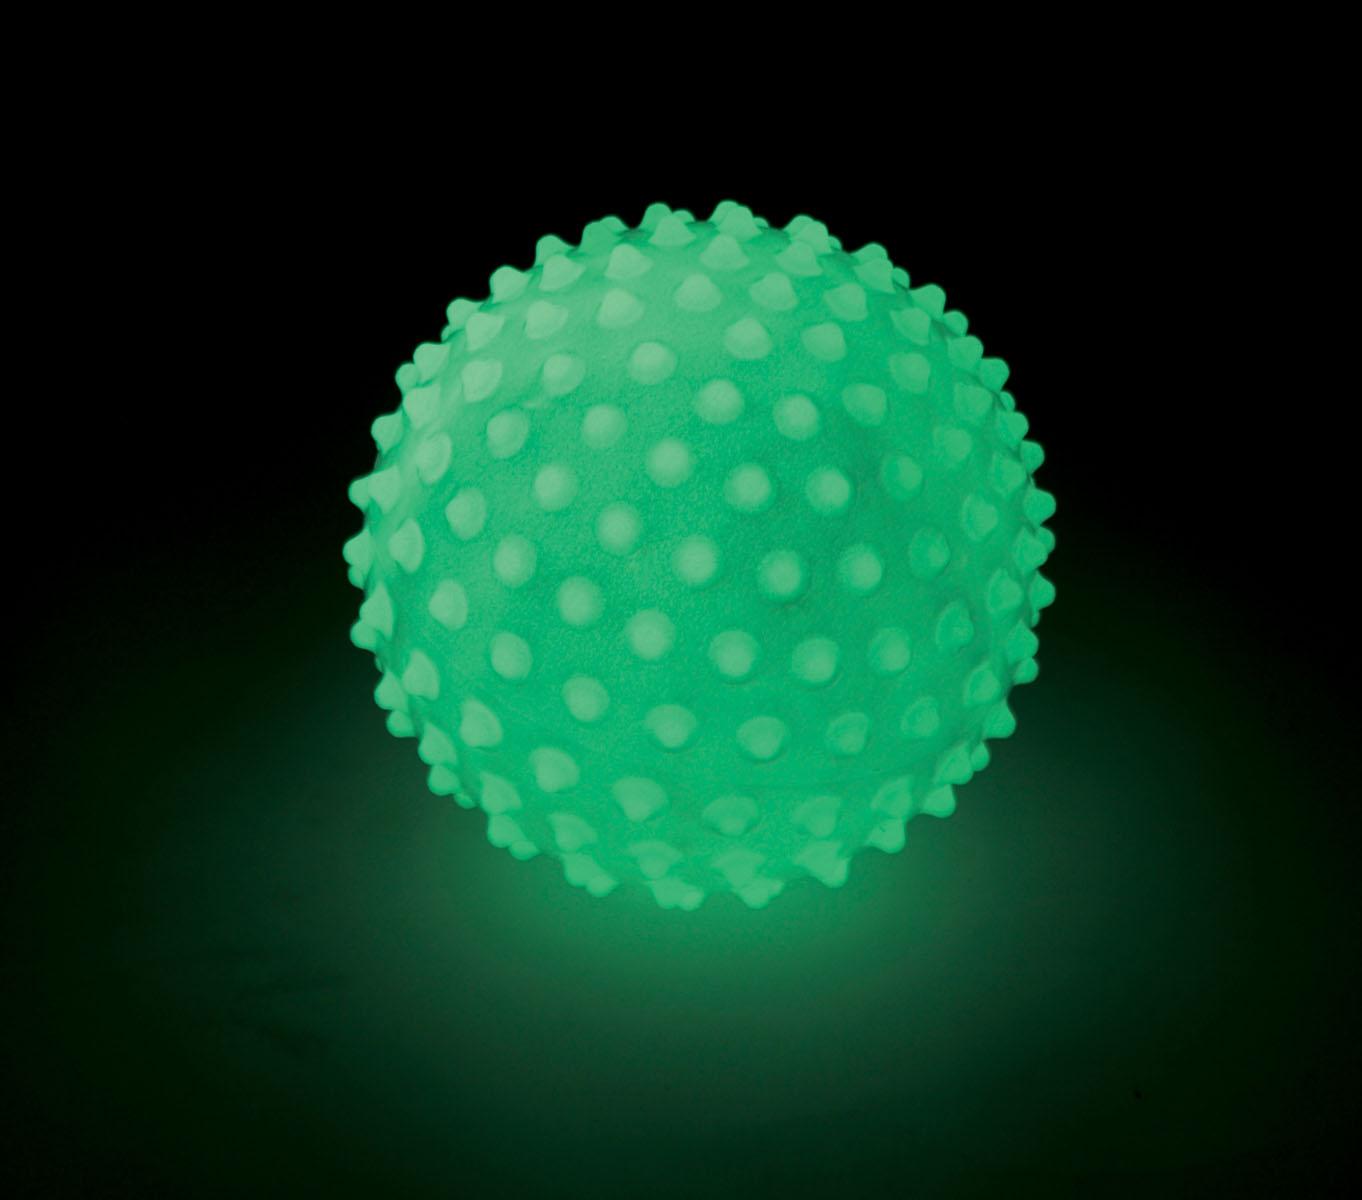 Glow in the dark sensory ball